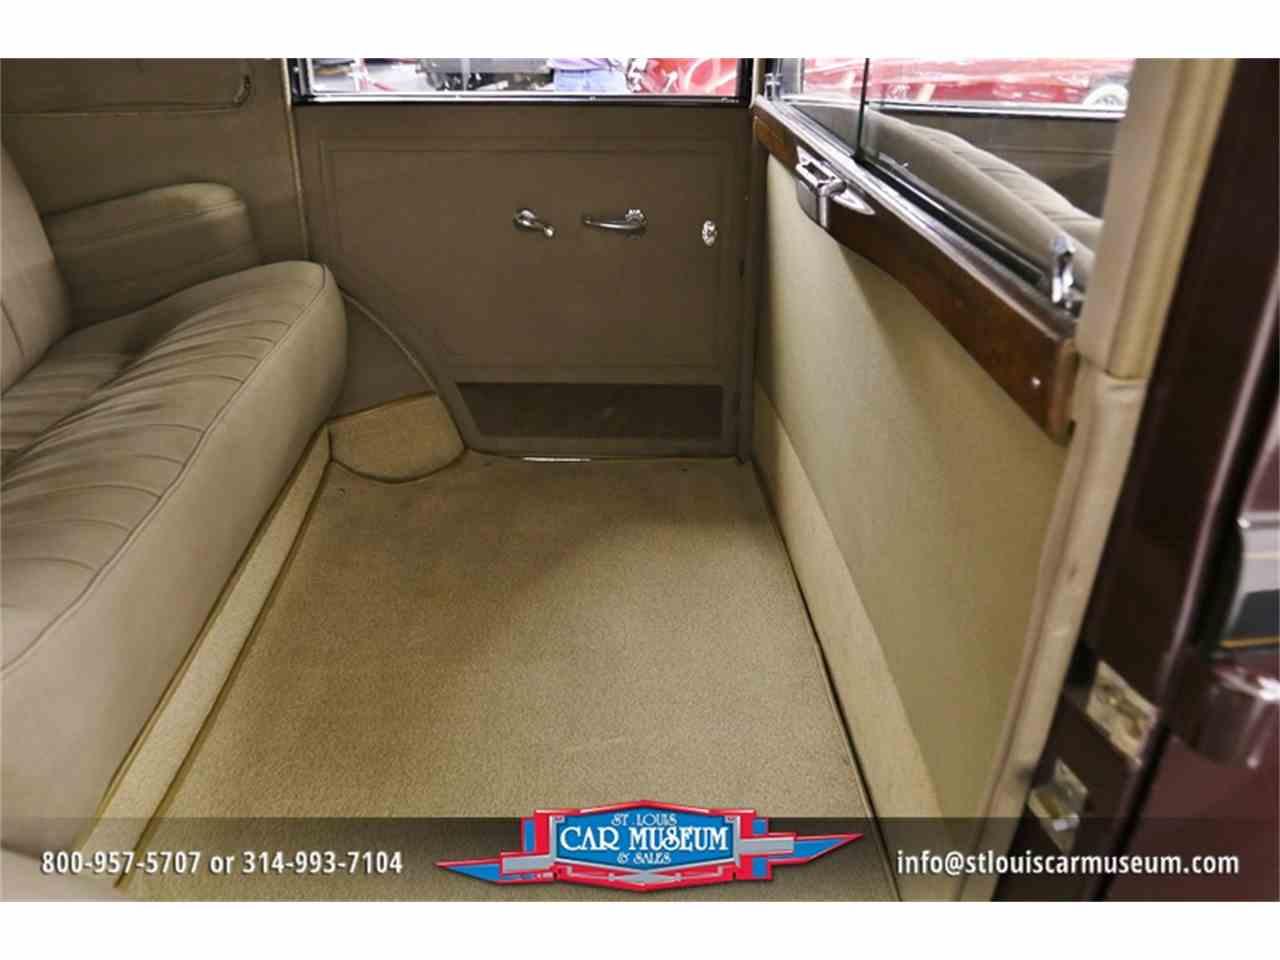 Large Picture of Classic '31 Cadillac V-16 Madam X Landau Sedan - $374,900.00 - JSU3